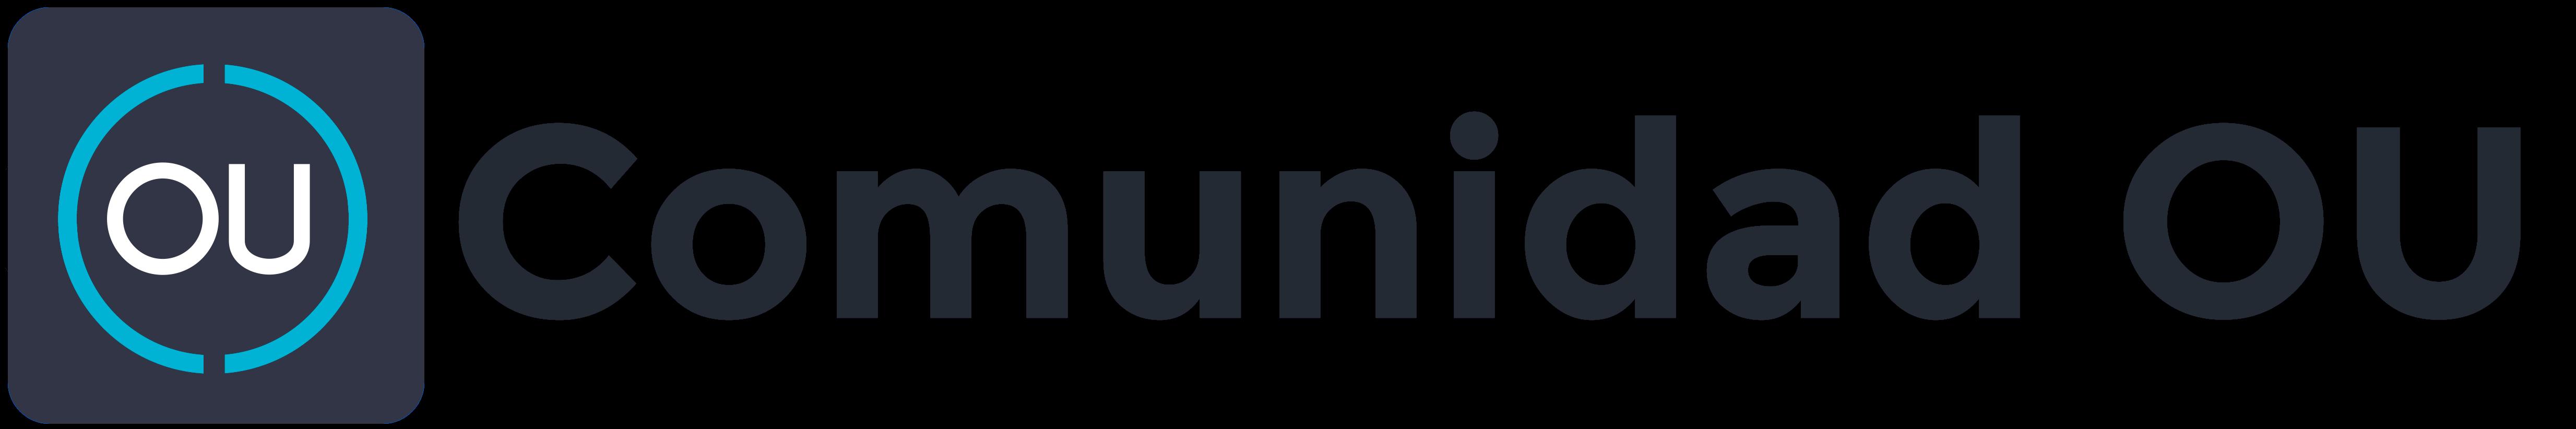 Comunidad OU